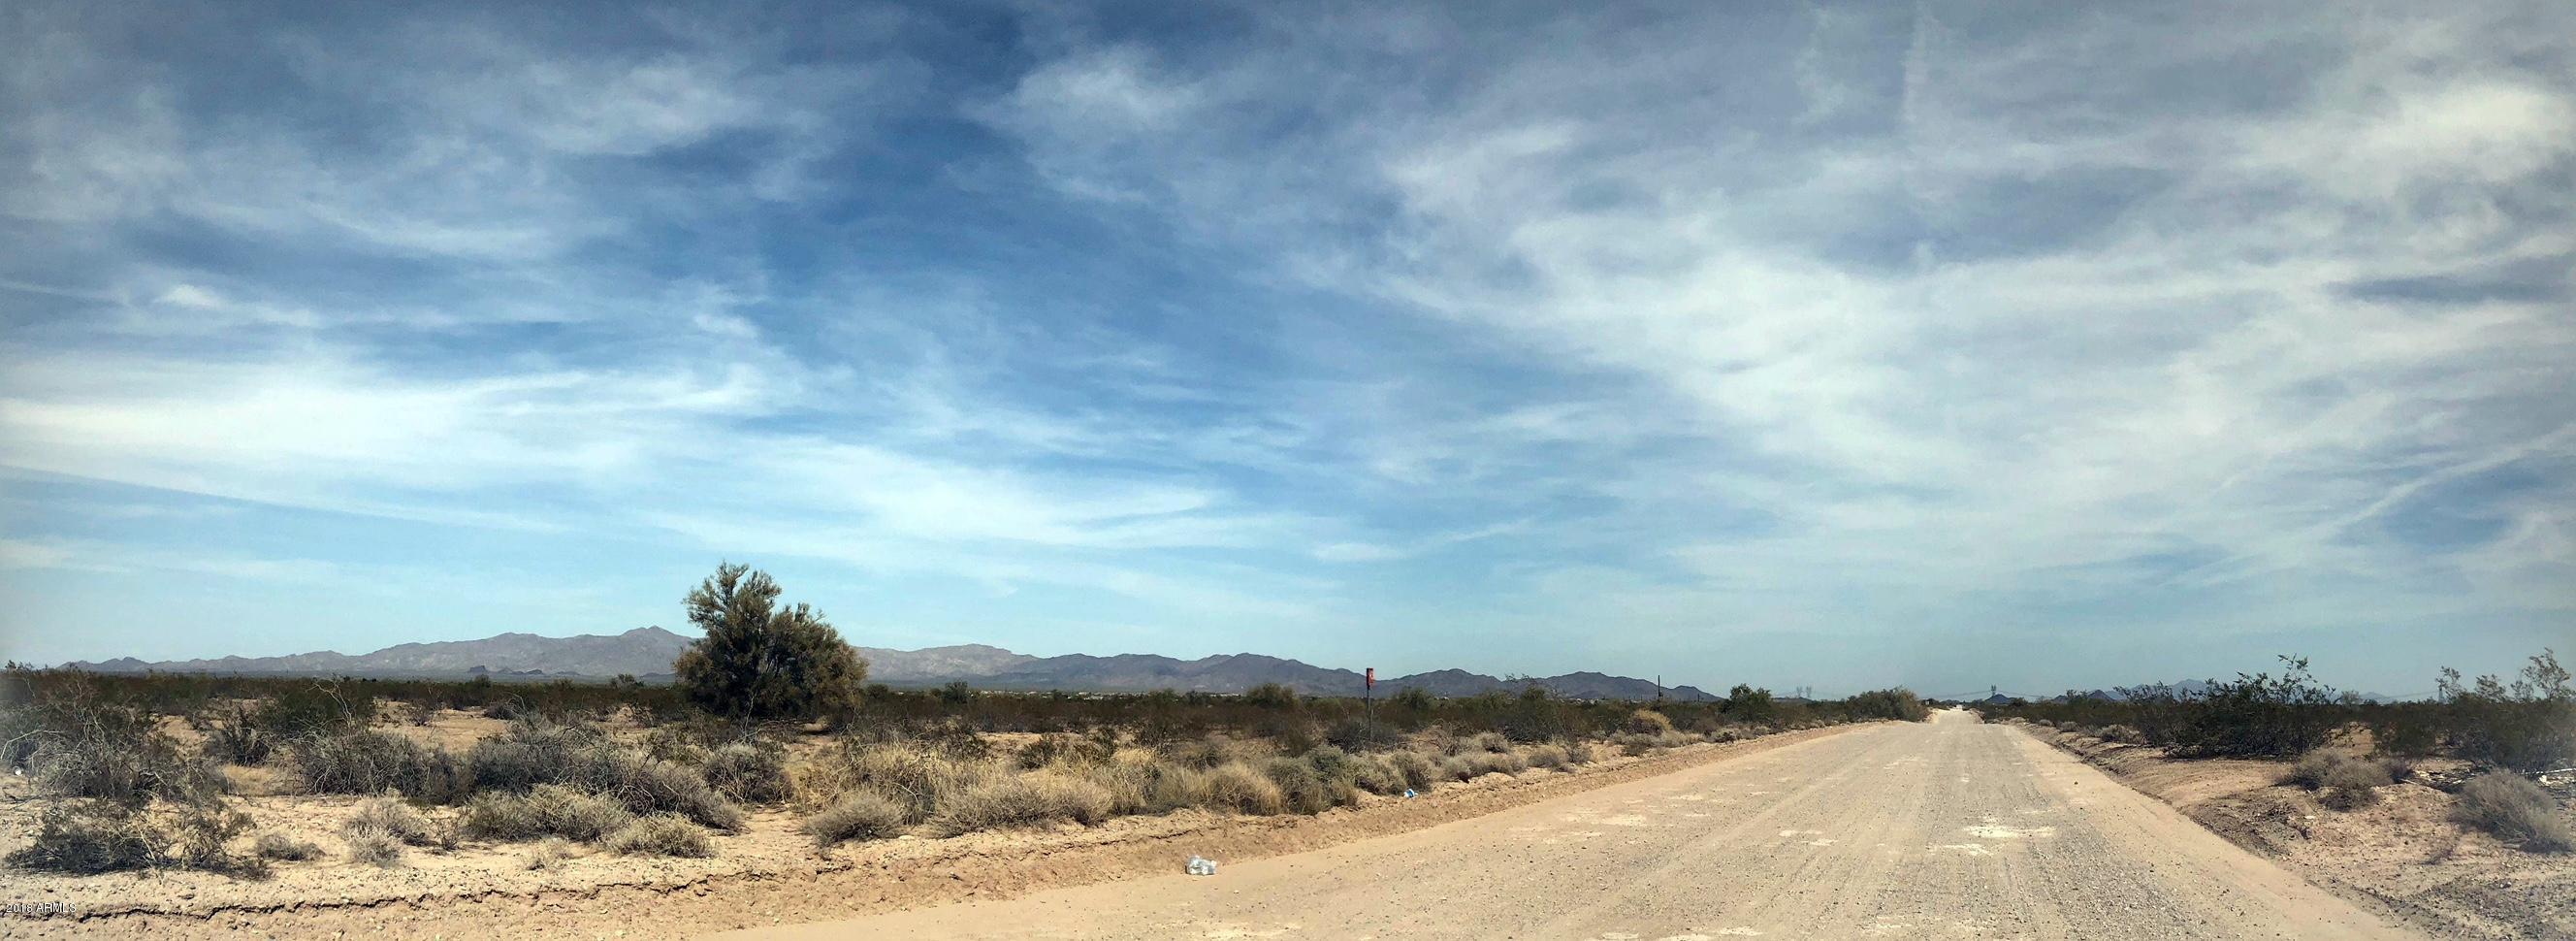 0 W Tonopah Salome Highway, Buckeye AZ 85396 - Photo 2